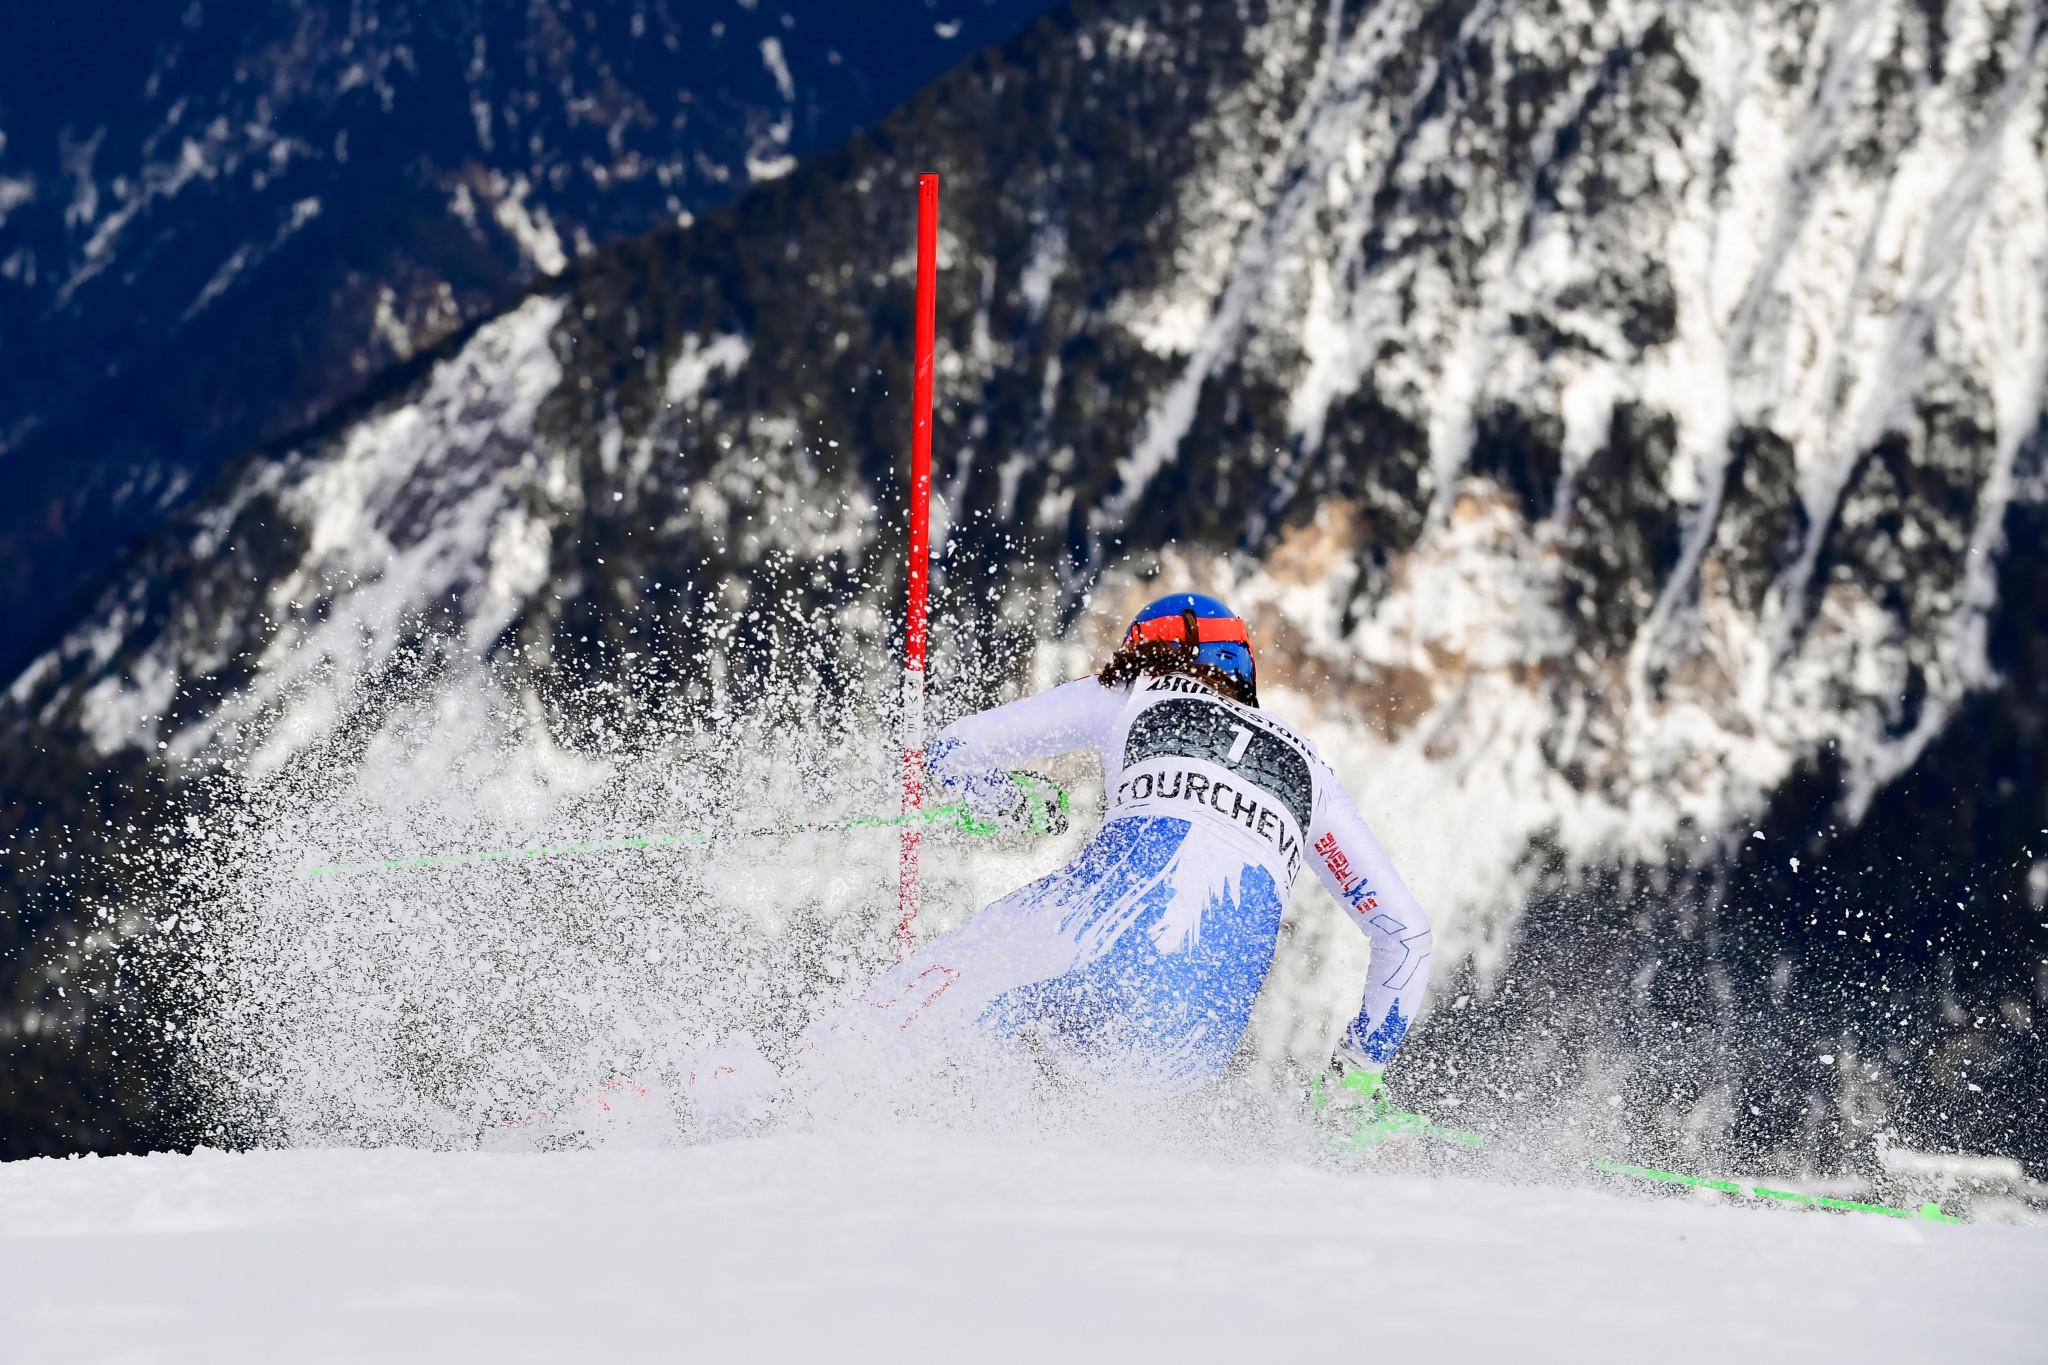 Font elected President of Courchevel-Méribel 2023 Alpine World Ski Championships